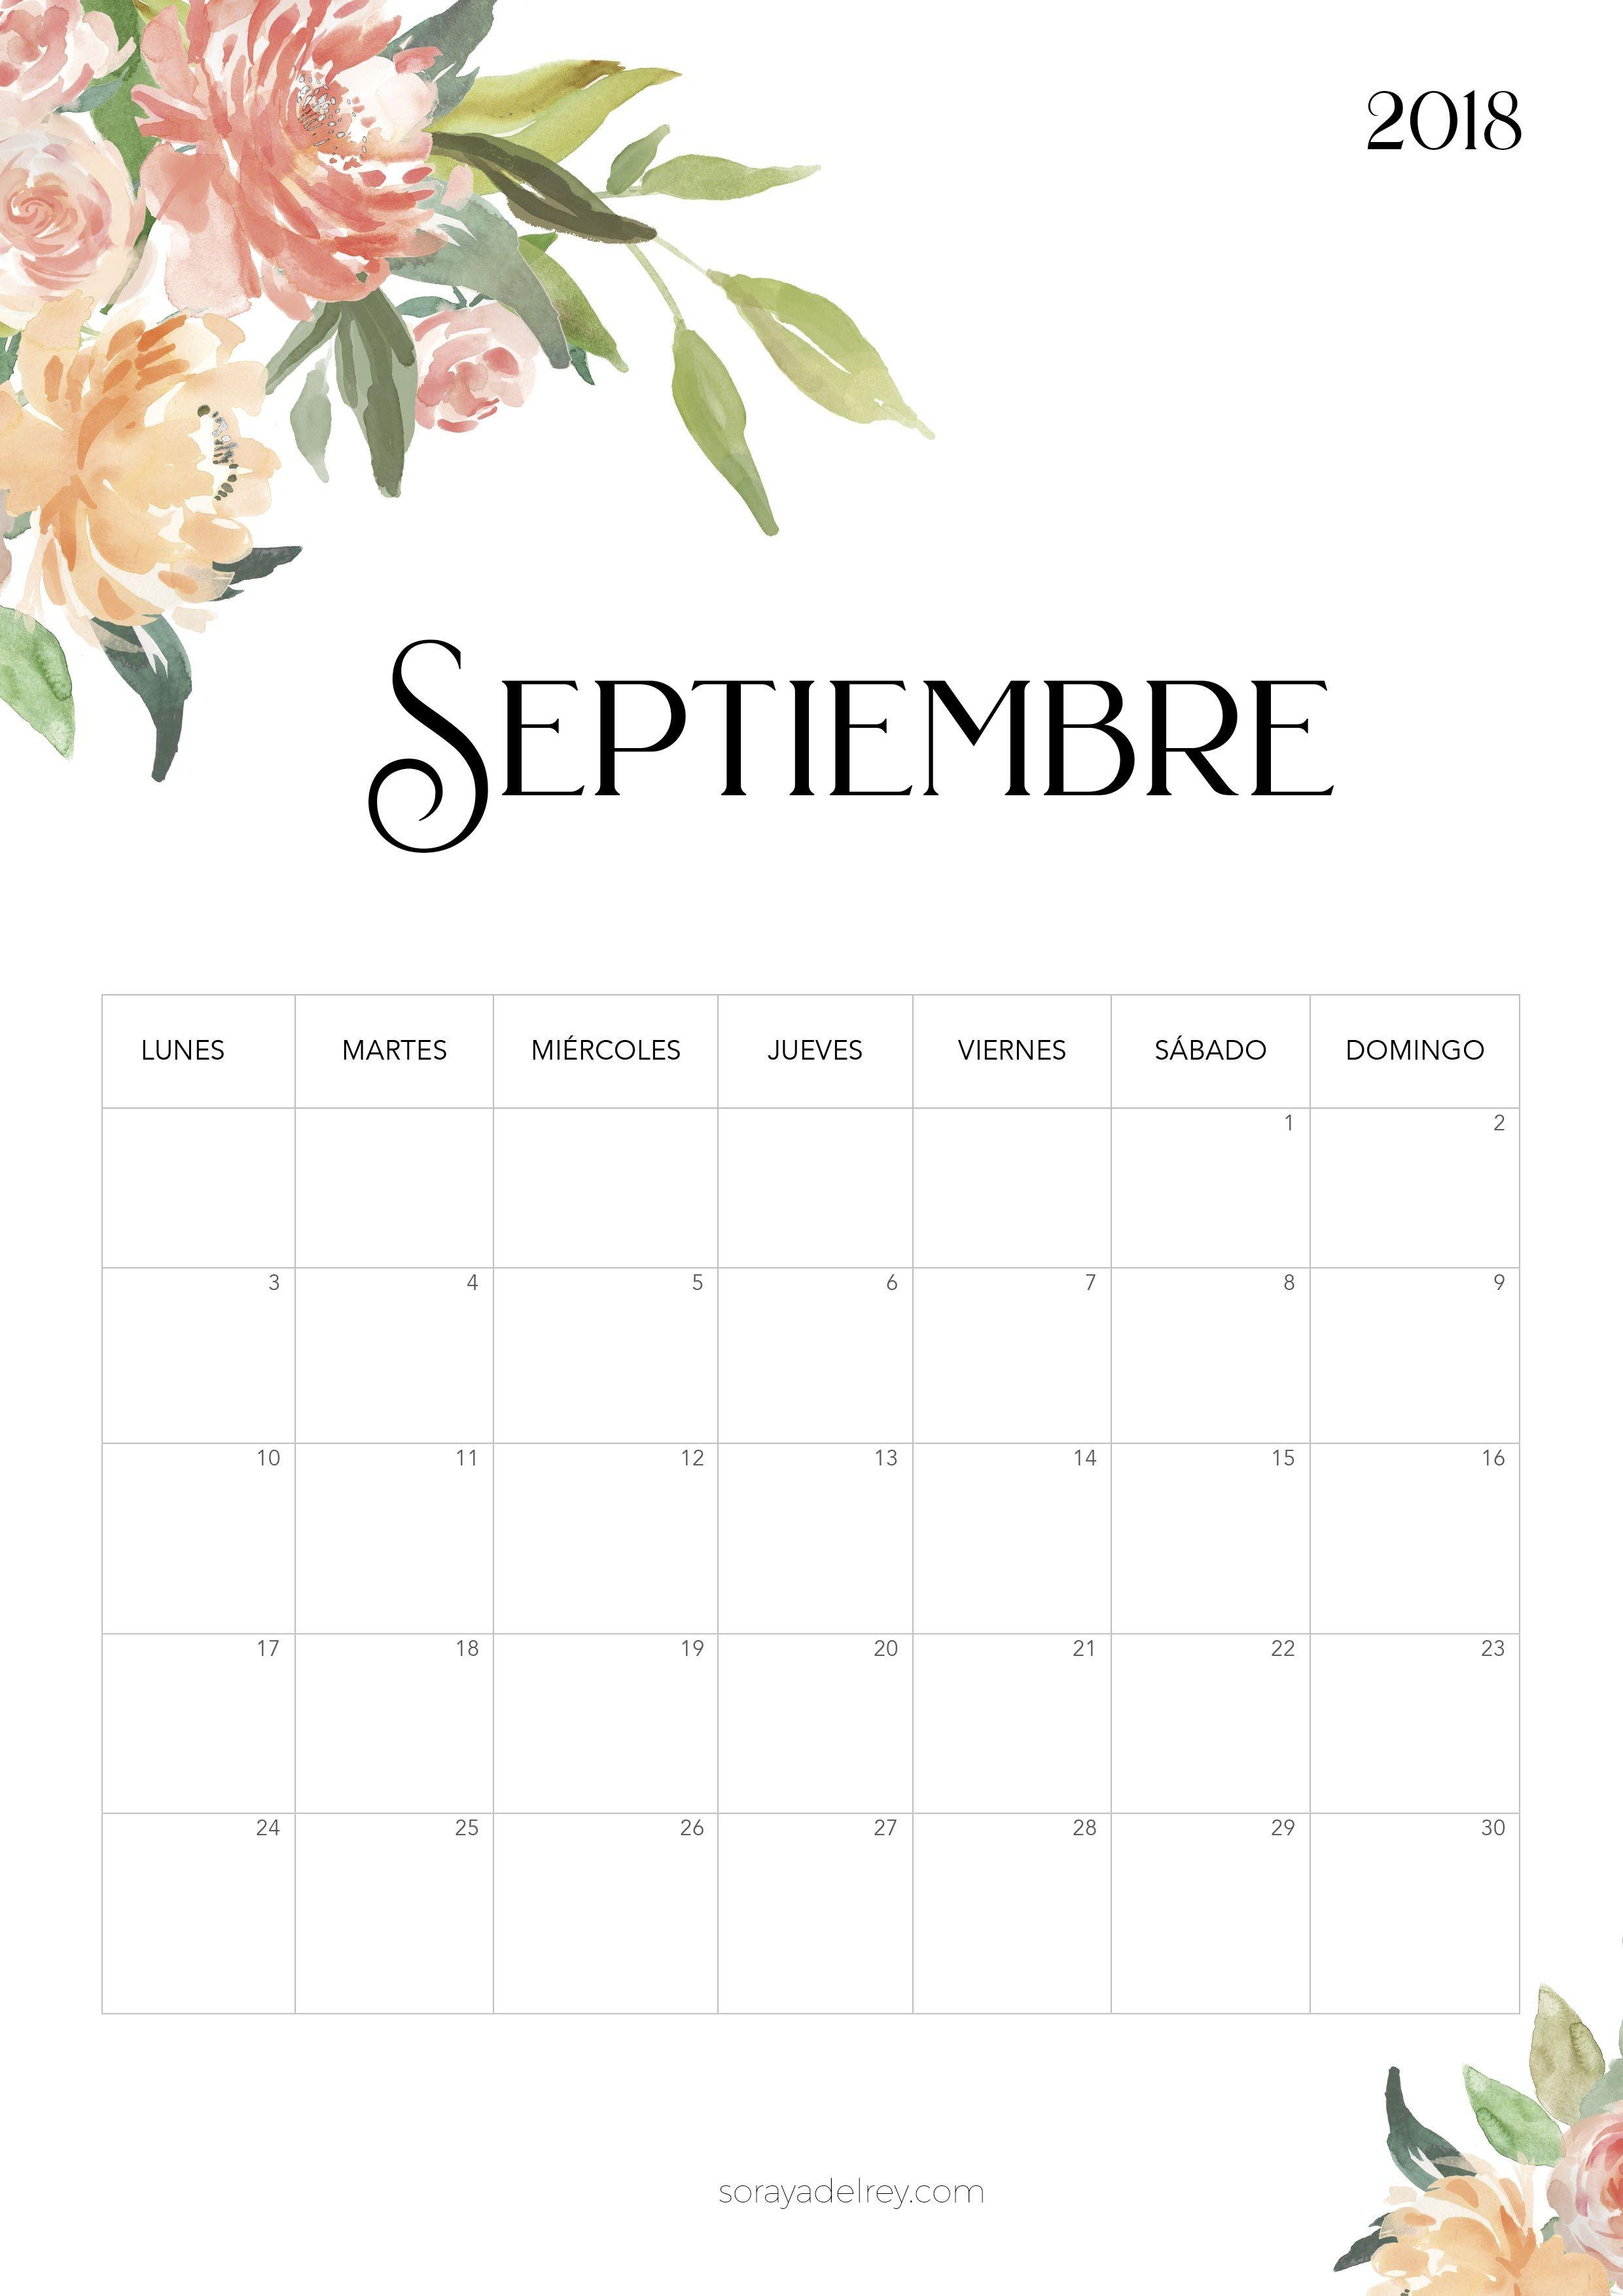 Calendario para imprimir septiembre 2018 freebie calendario calendar septiembre flowers